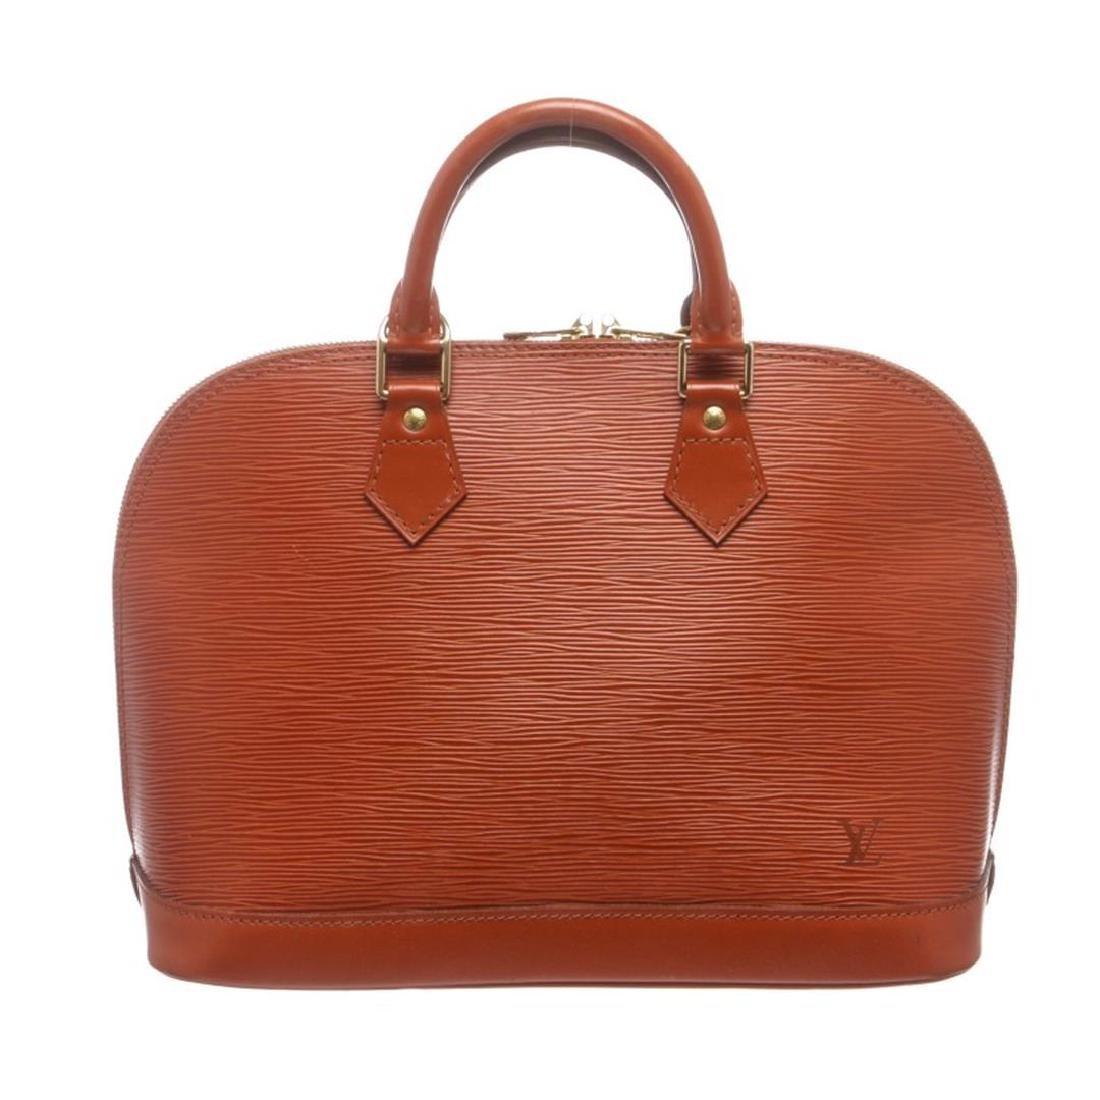 Louis Vuitton Sienna Brown Epi Leather Alma PM Bag